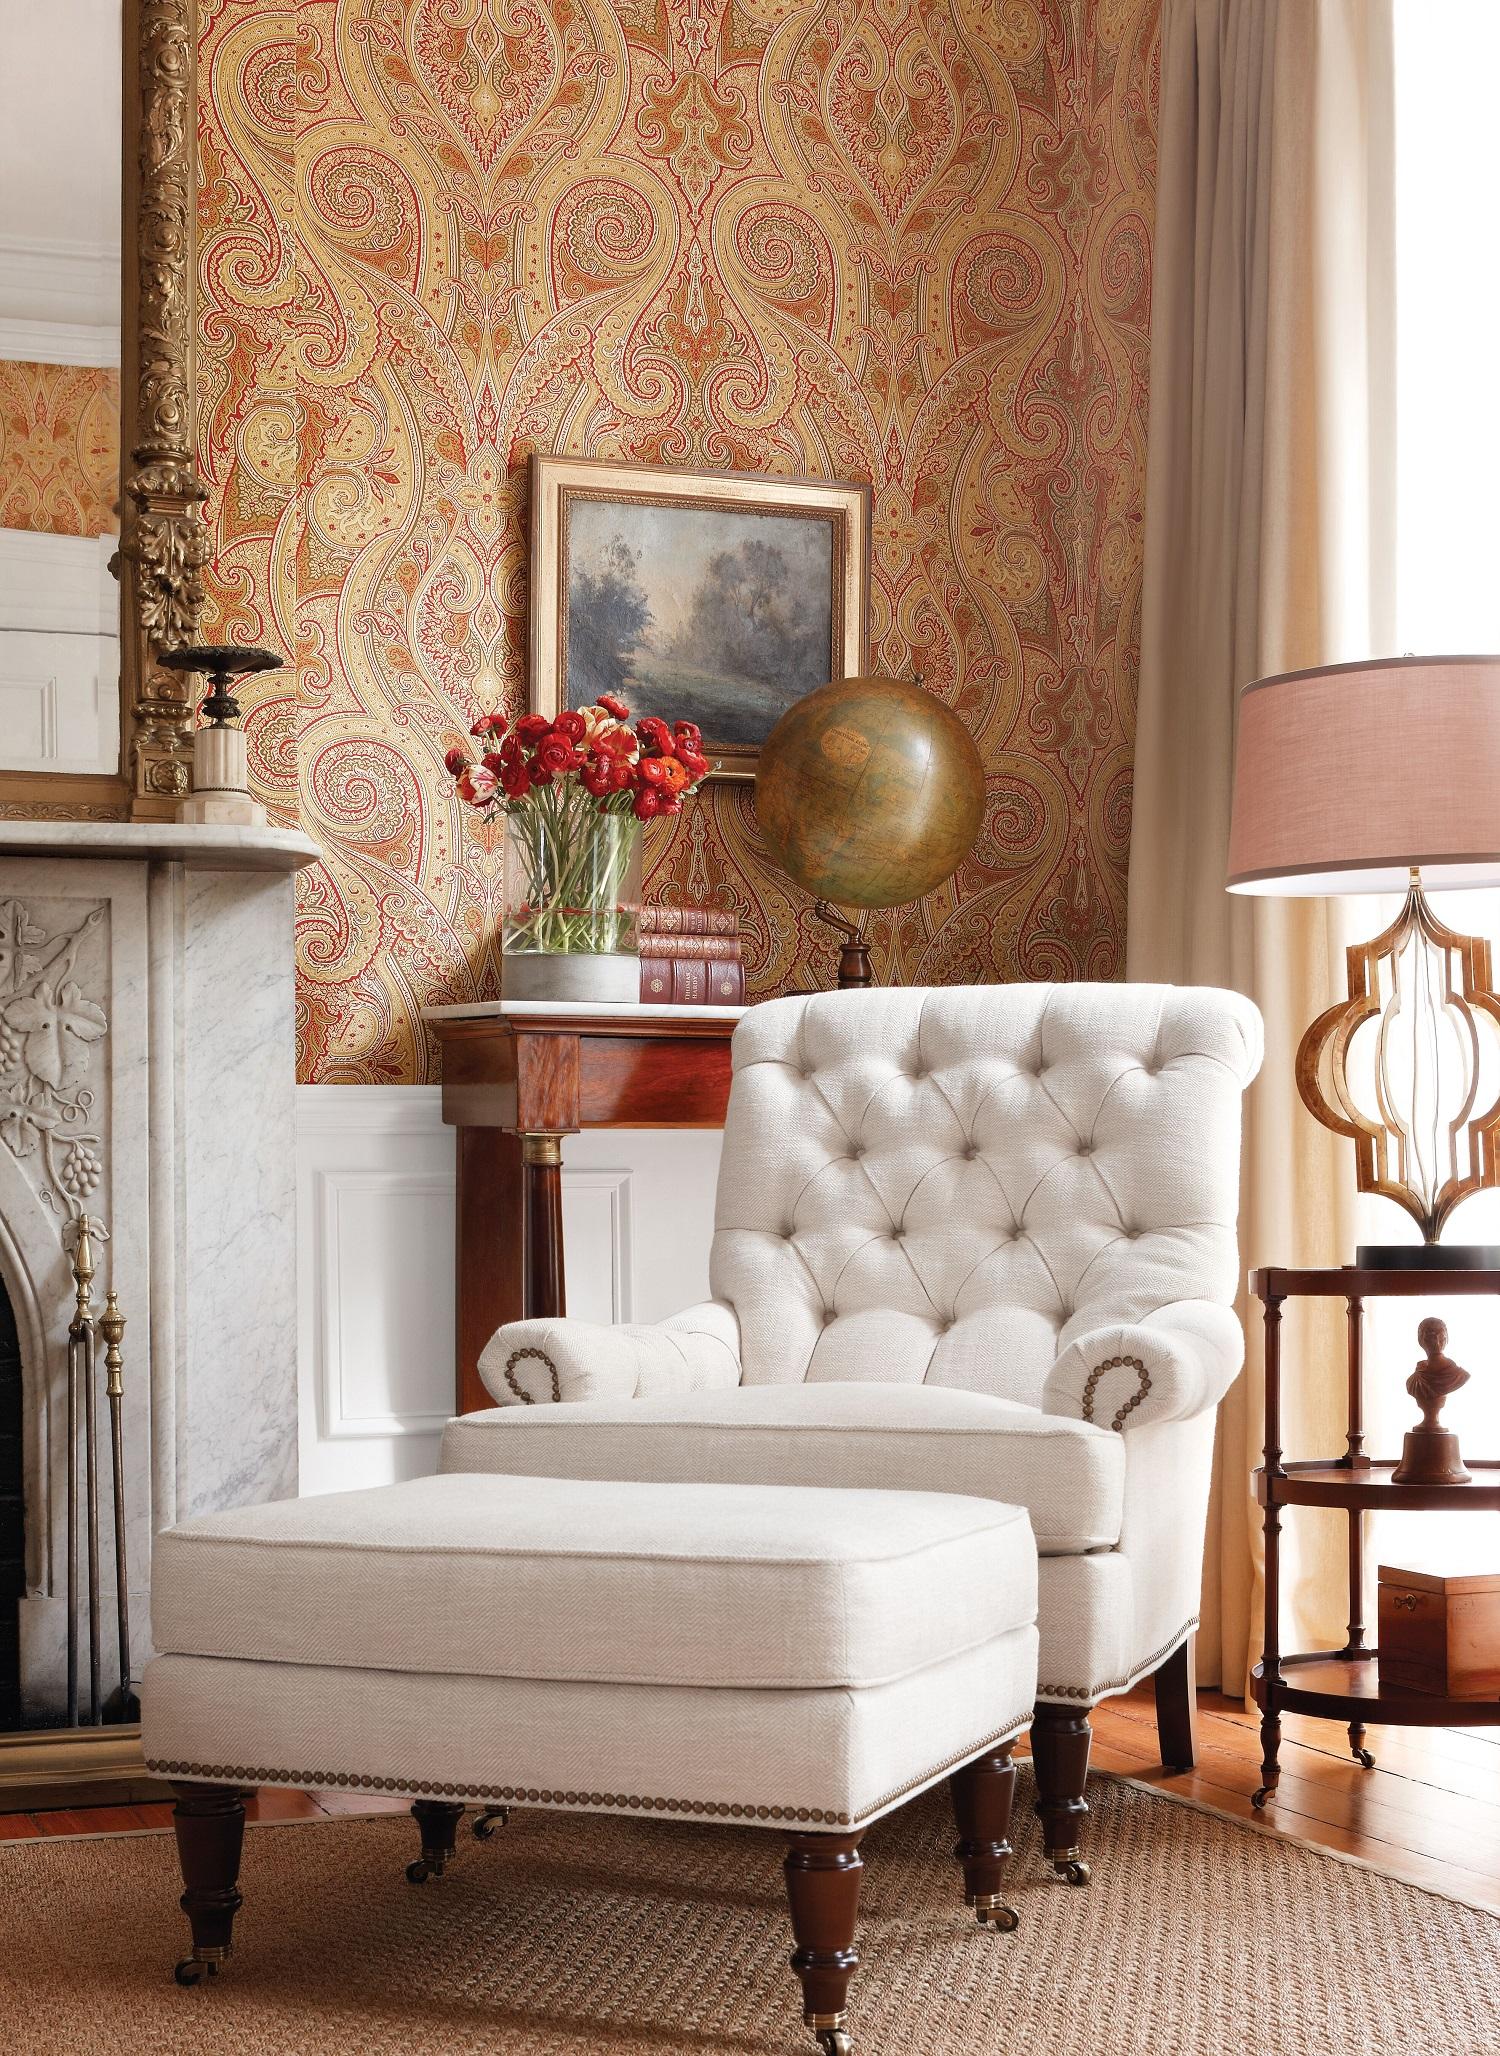 Photo 5 Thibaut-Chair Companion - Copy.jpeg